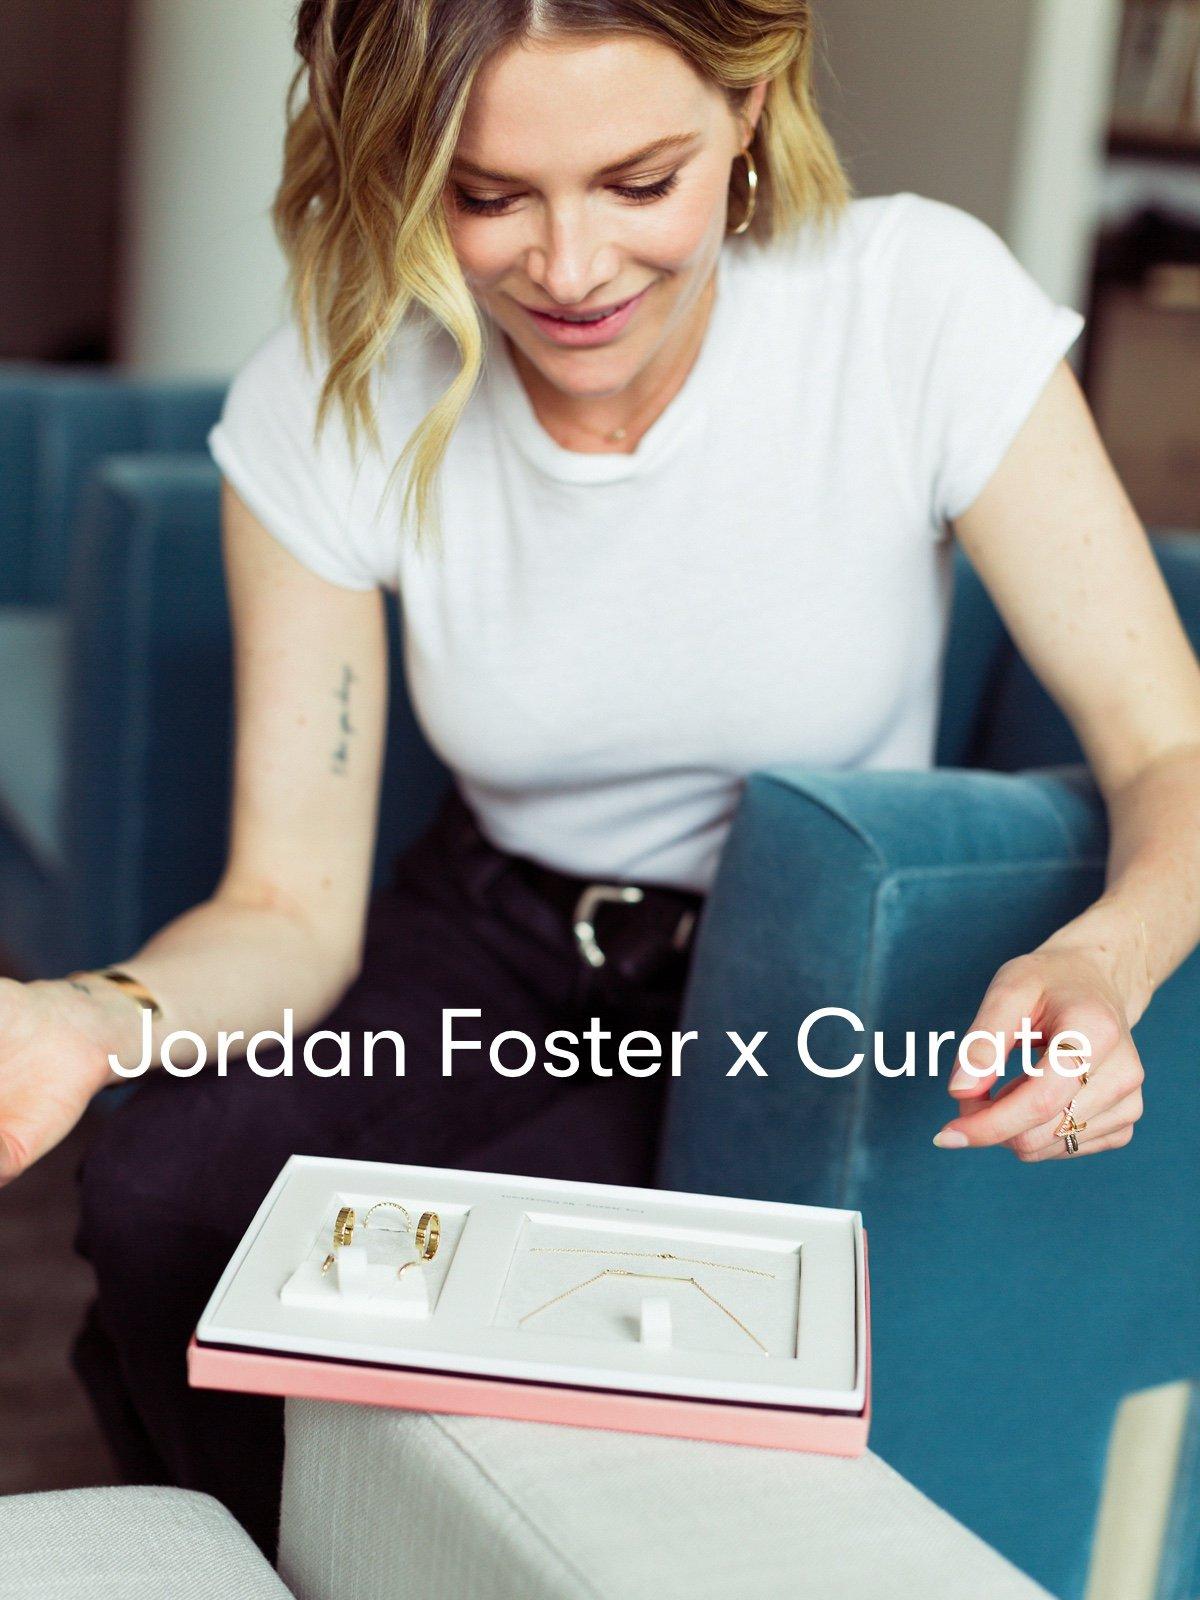 Jordan Foster x Curate